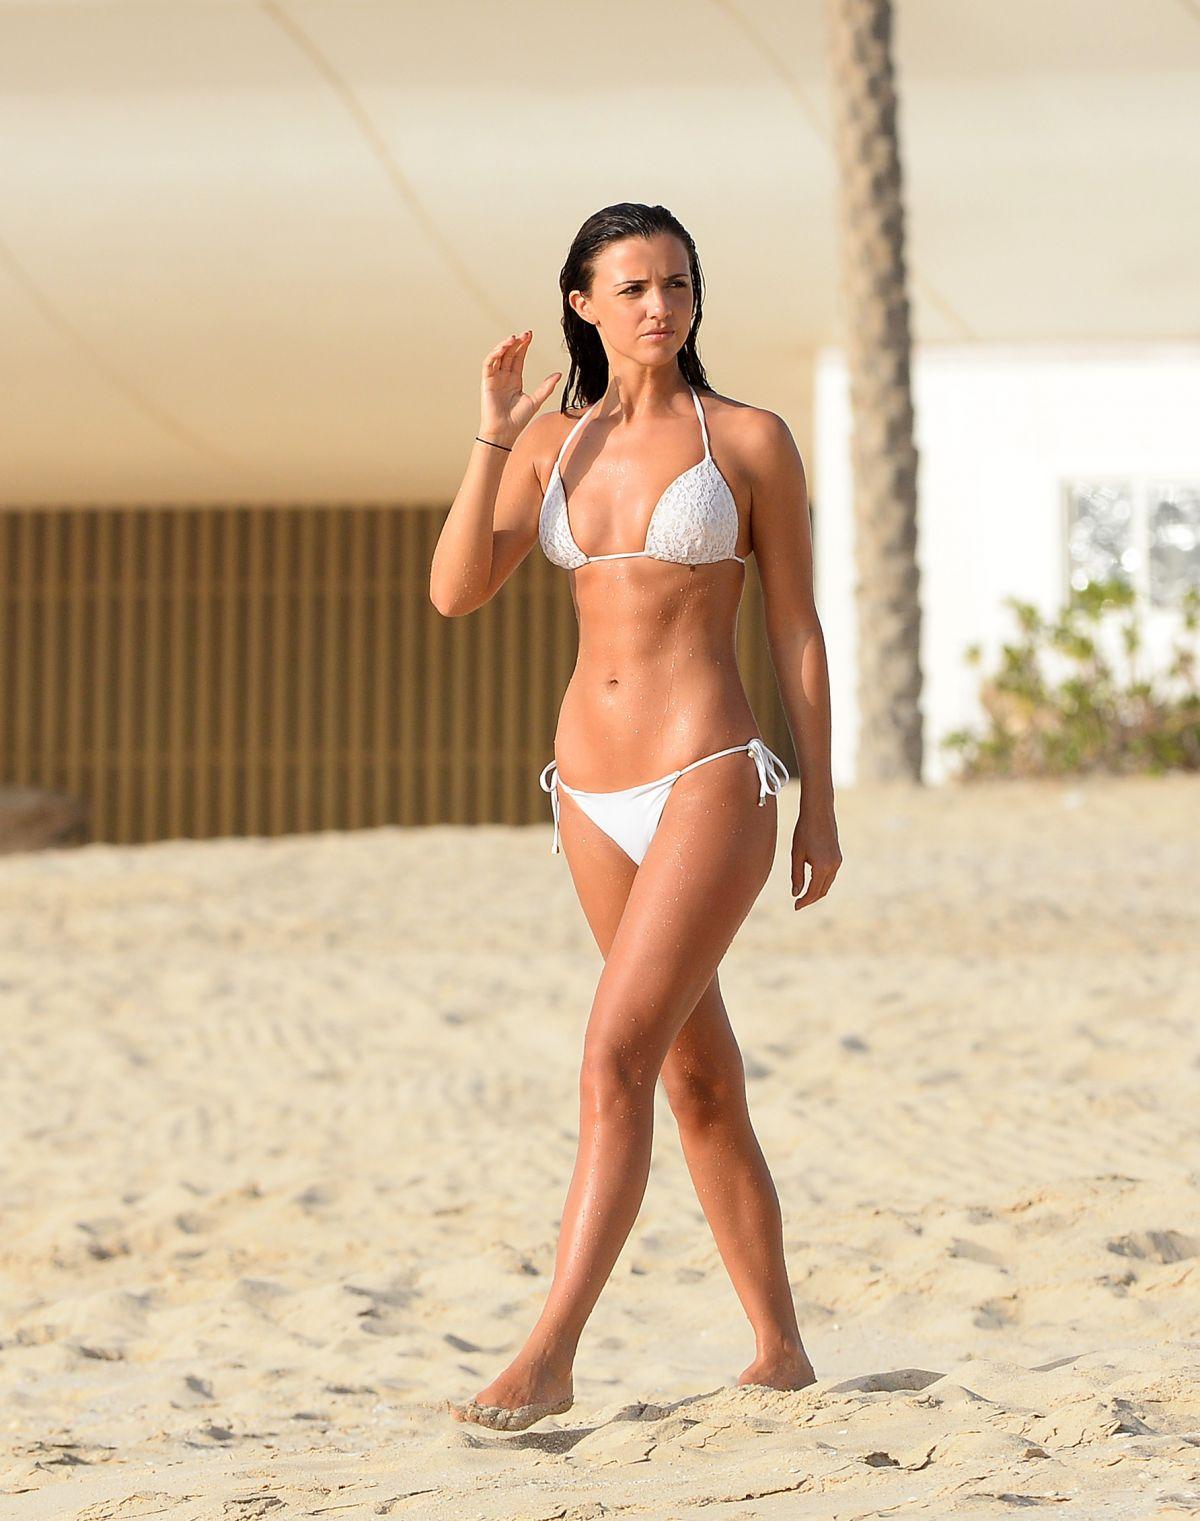 LUCY MECKLENBURGH in Bikini at a Beach in Dubai, April 2016 - HawtCelebs